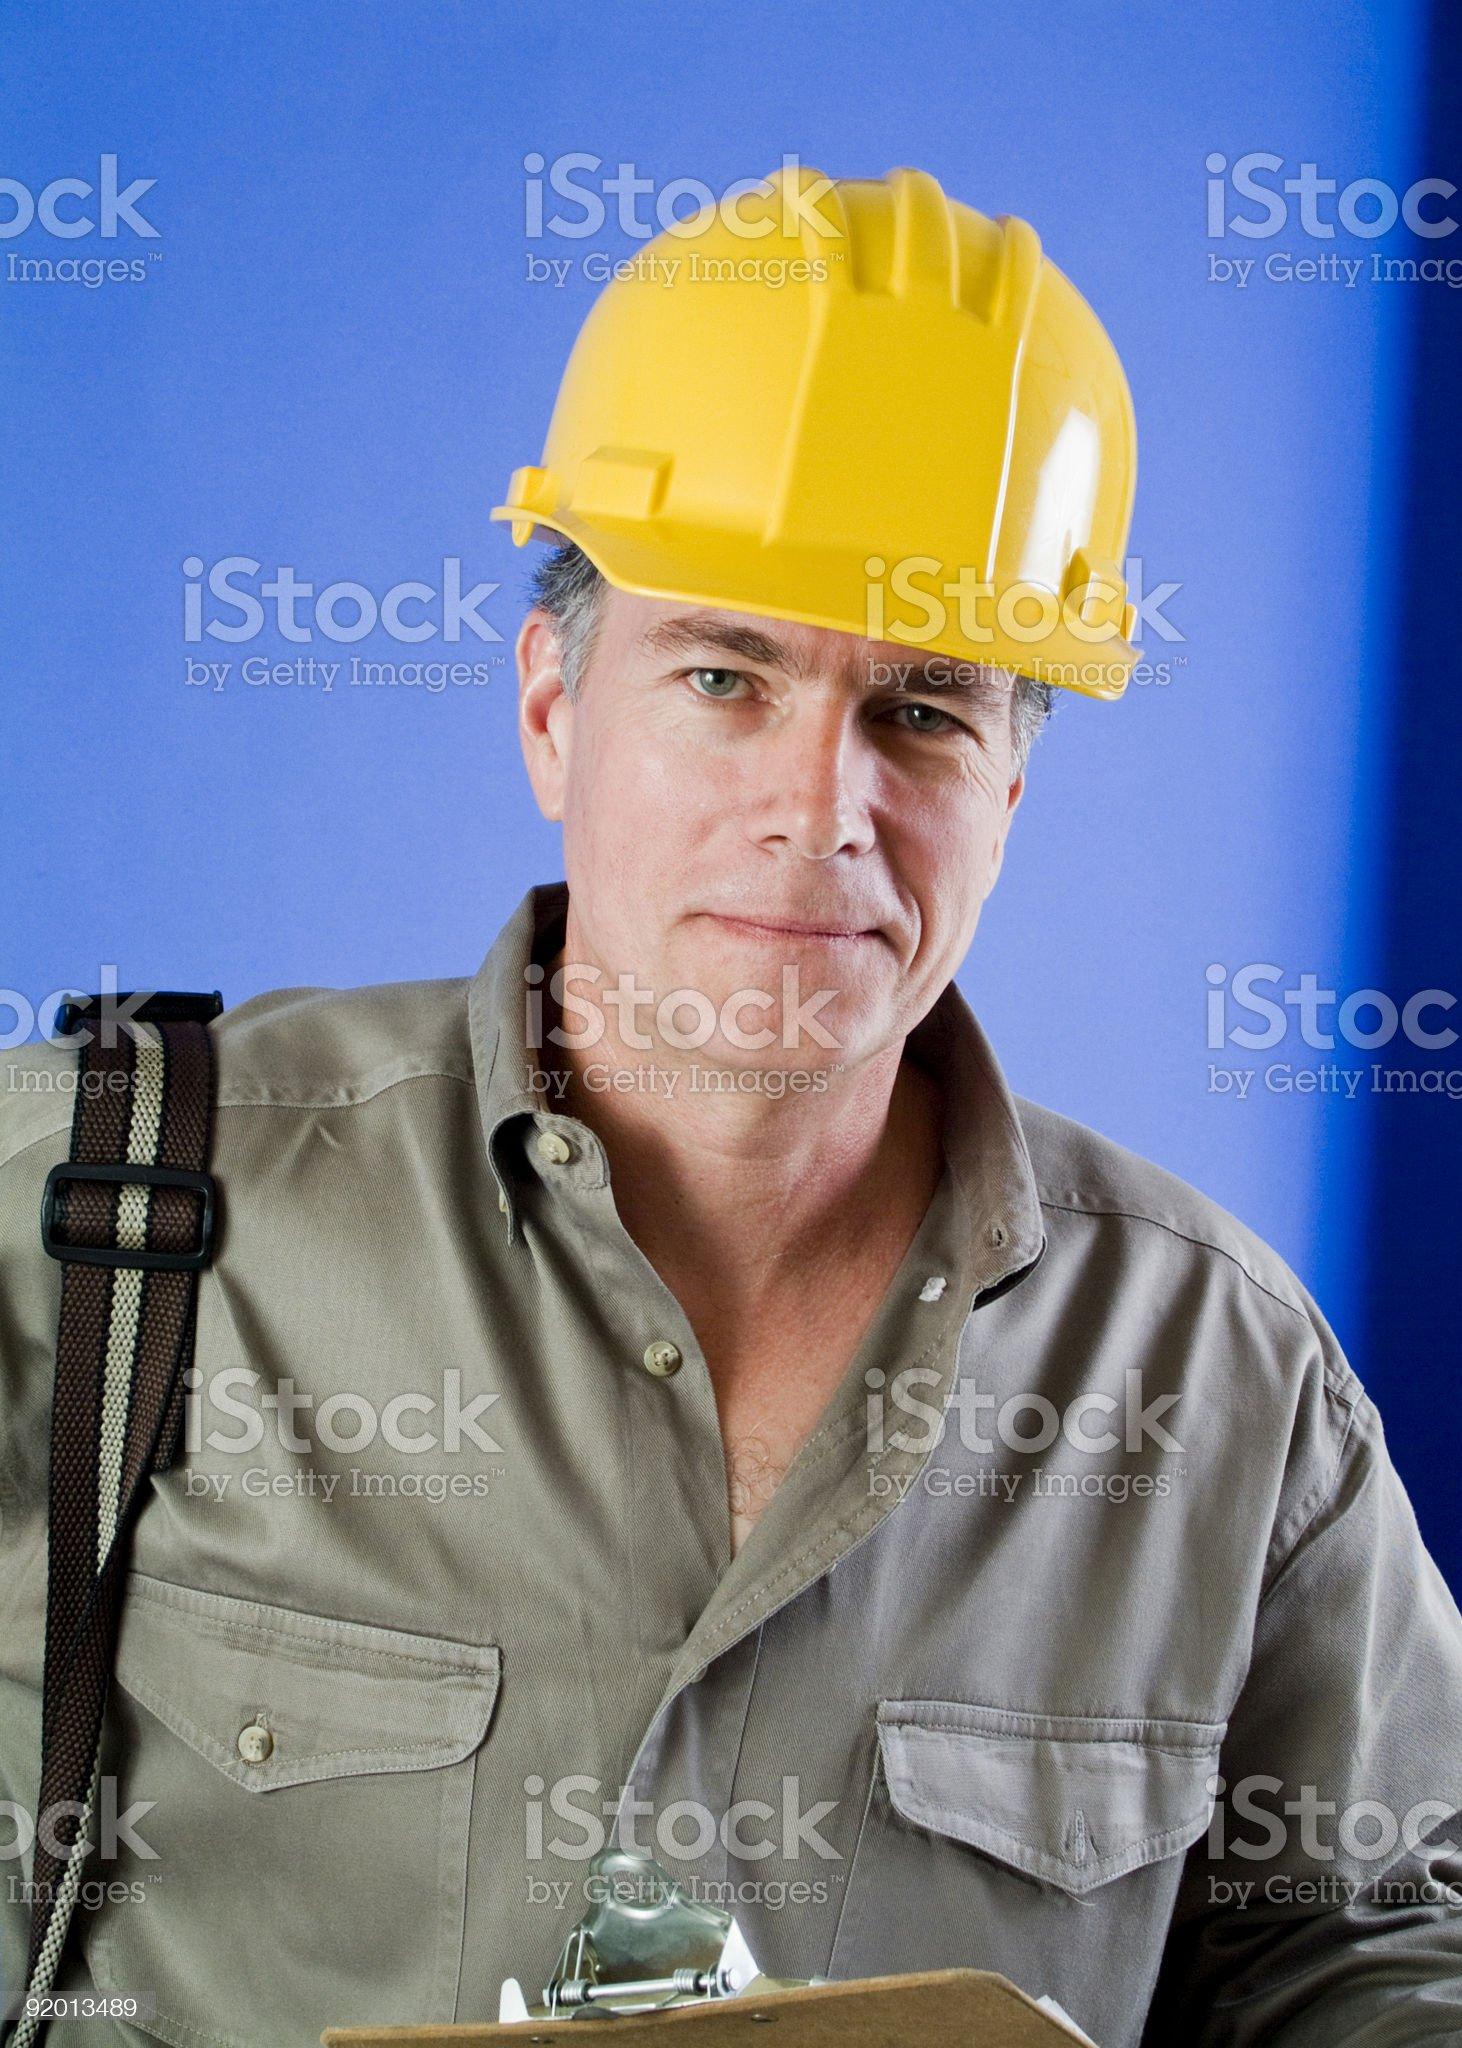 Foreman on the Job royalty-free stock photo